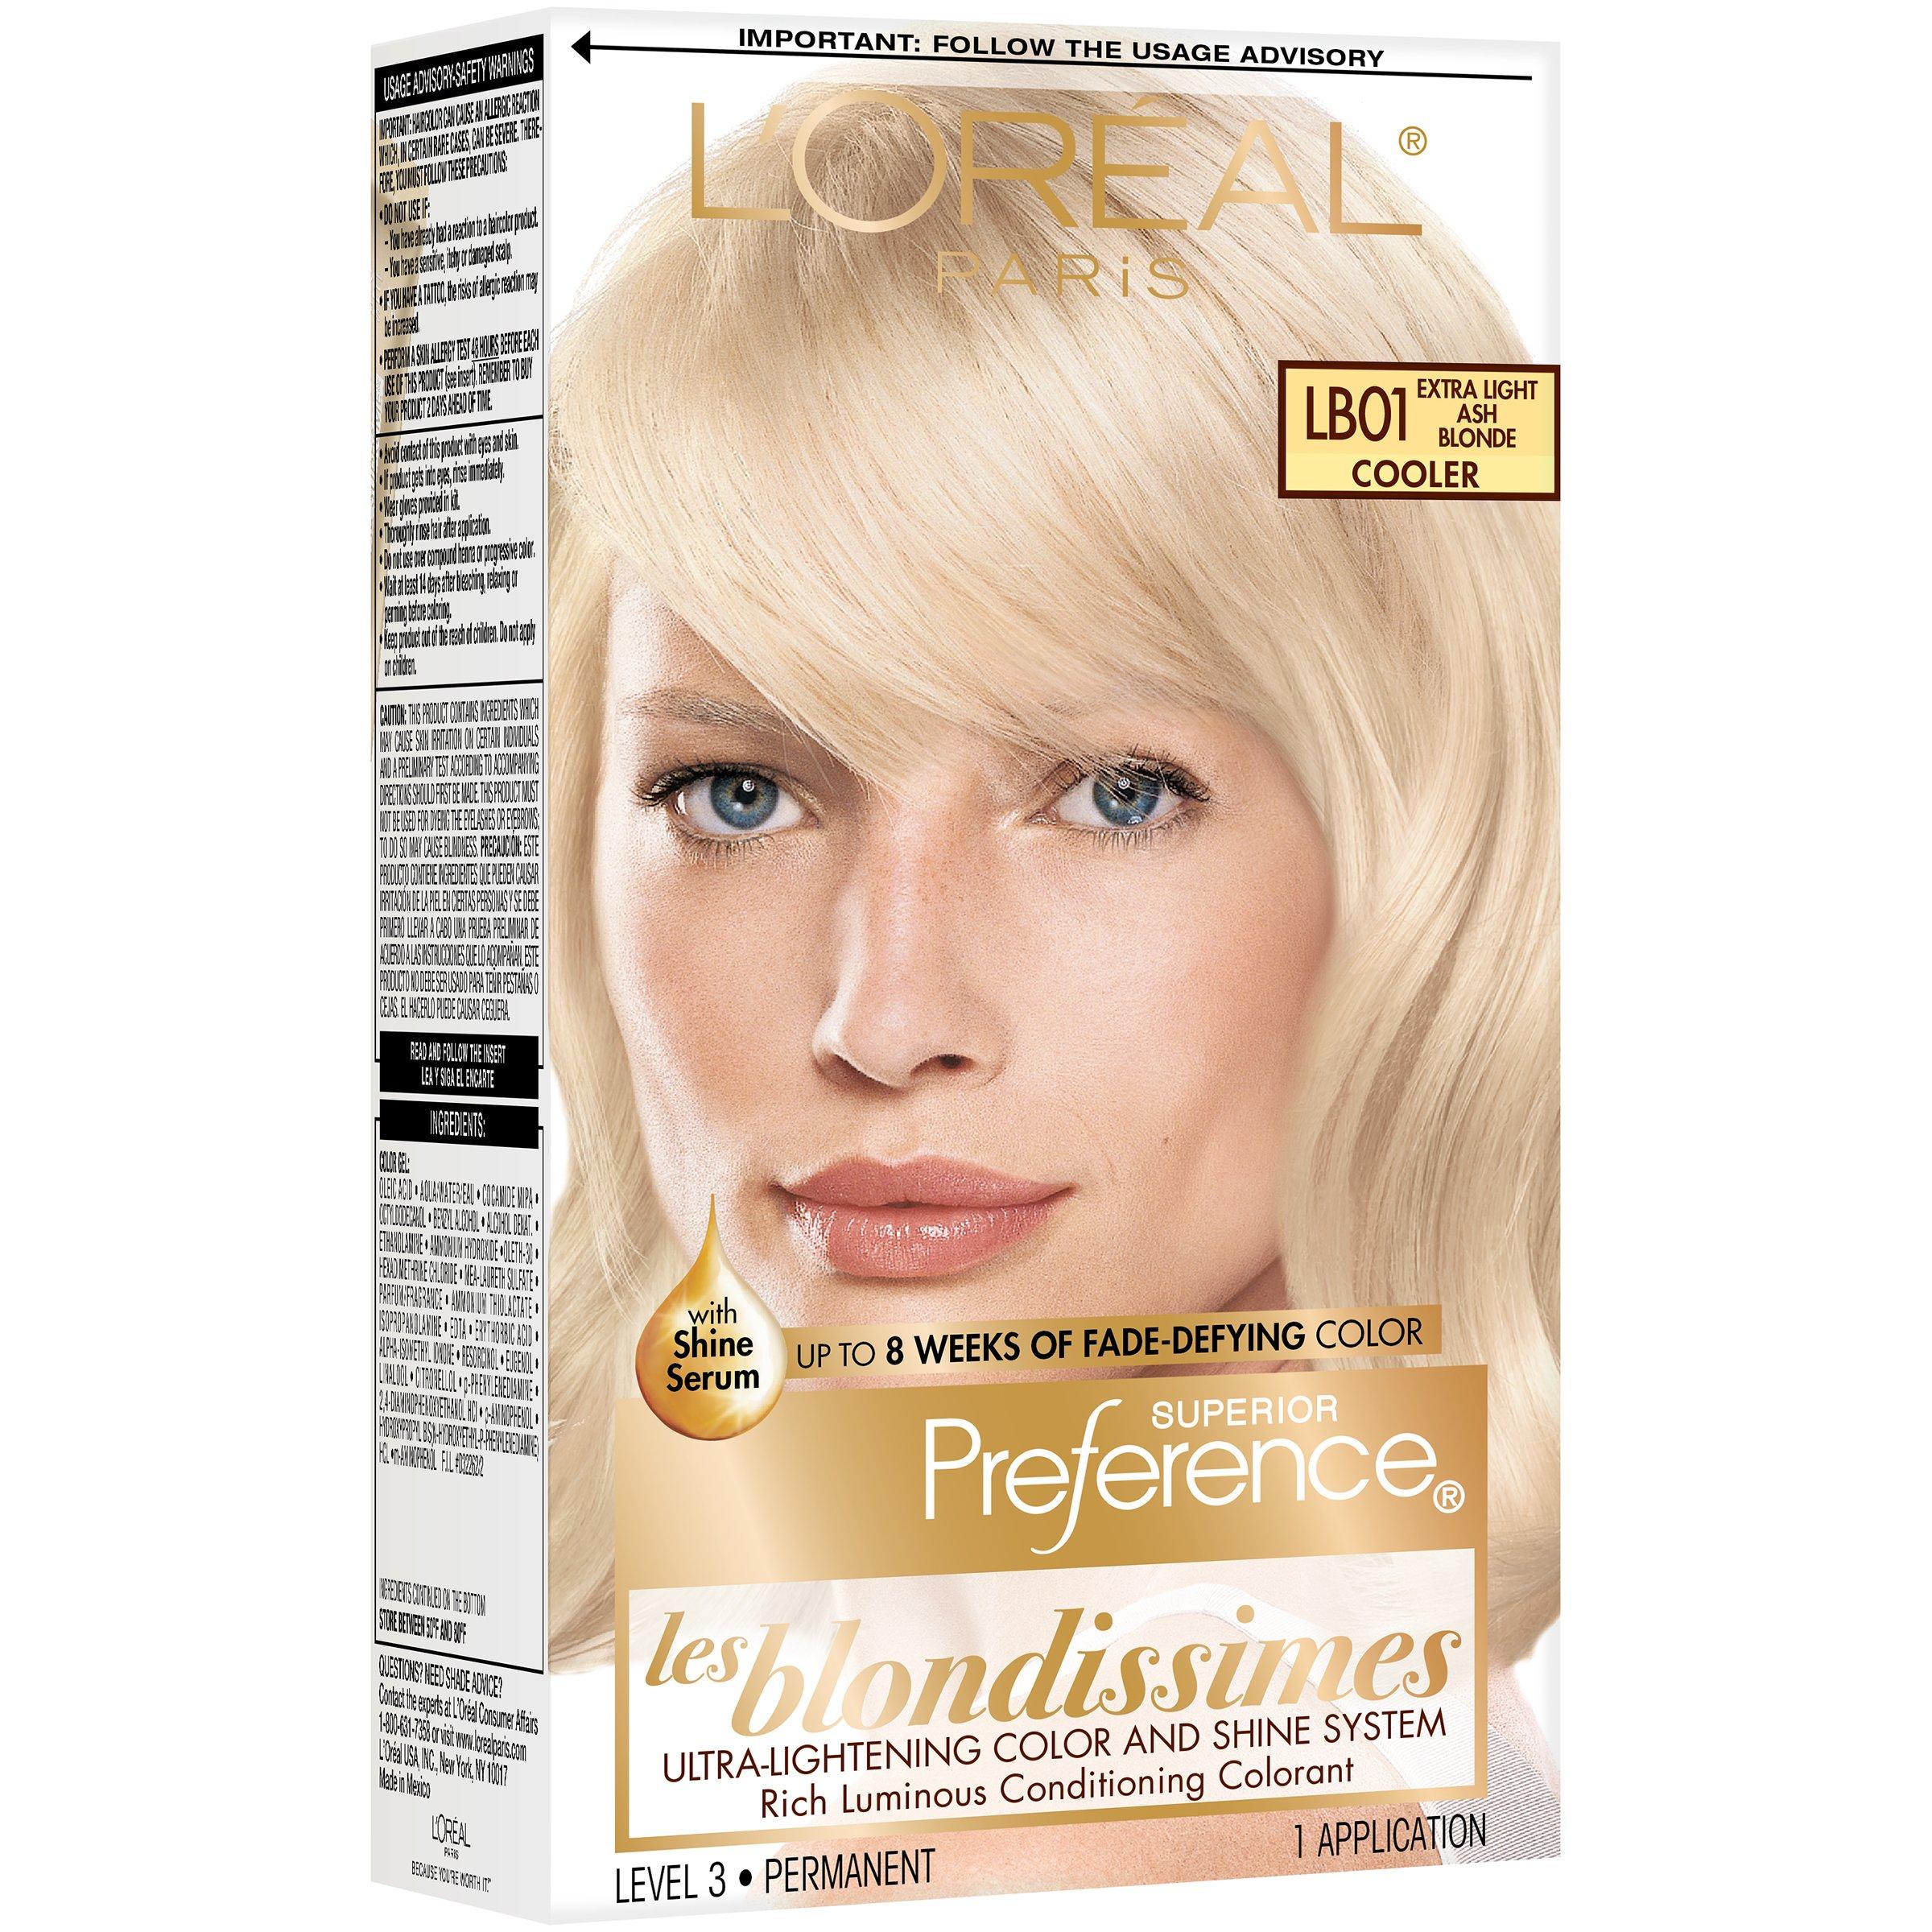 L Oreal Paris Superior Preference Permanent Hair Color Lb01 Extra Light Ash Blonde Shop Hair Color At H E B